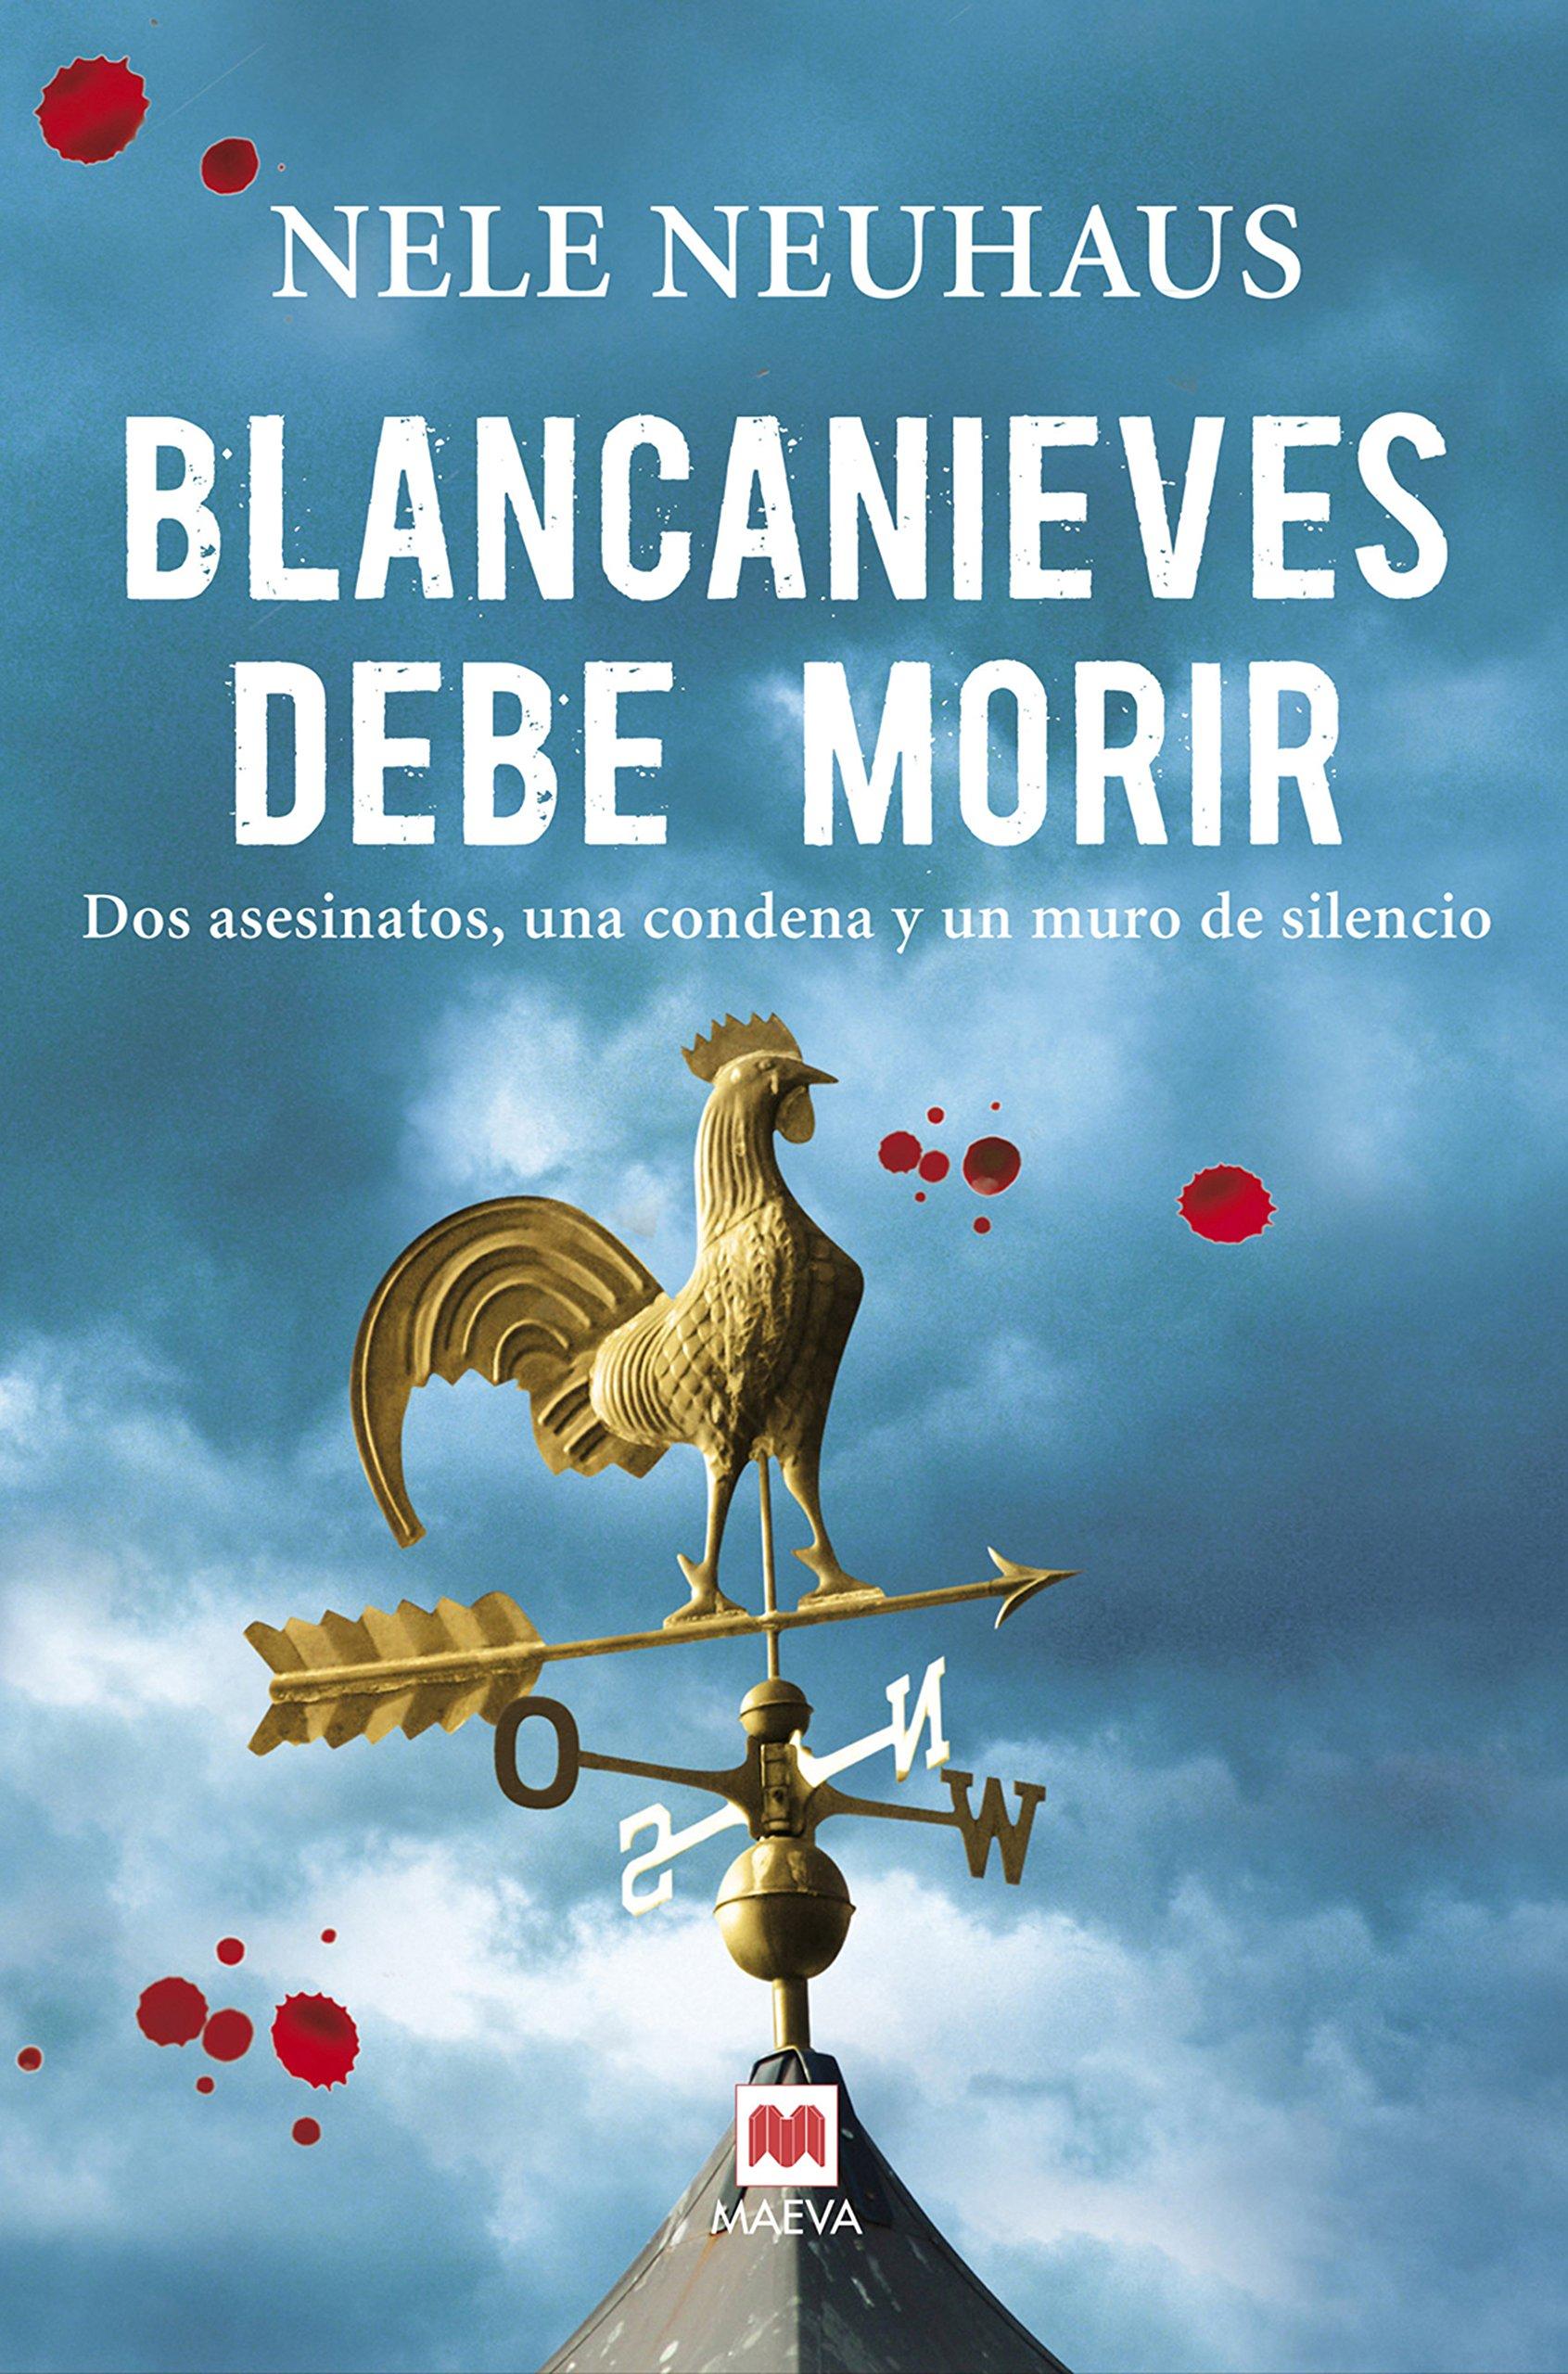 Blancanieves debe morir: (Taunus 1) (MAEVA noir): Amazon.es: Nele Neuhaus, Mª José Díez Pérez: Libros